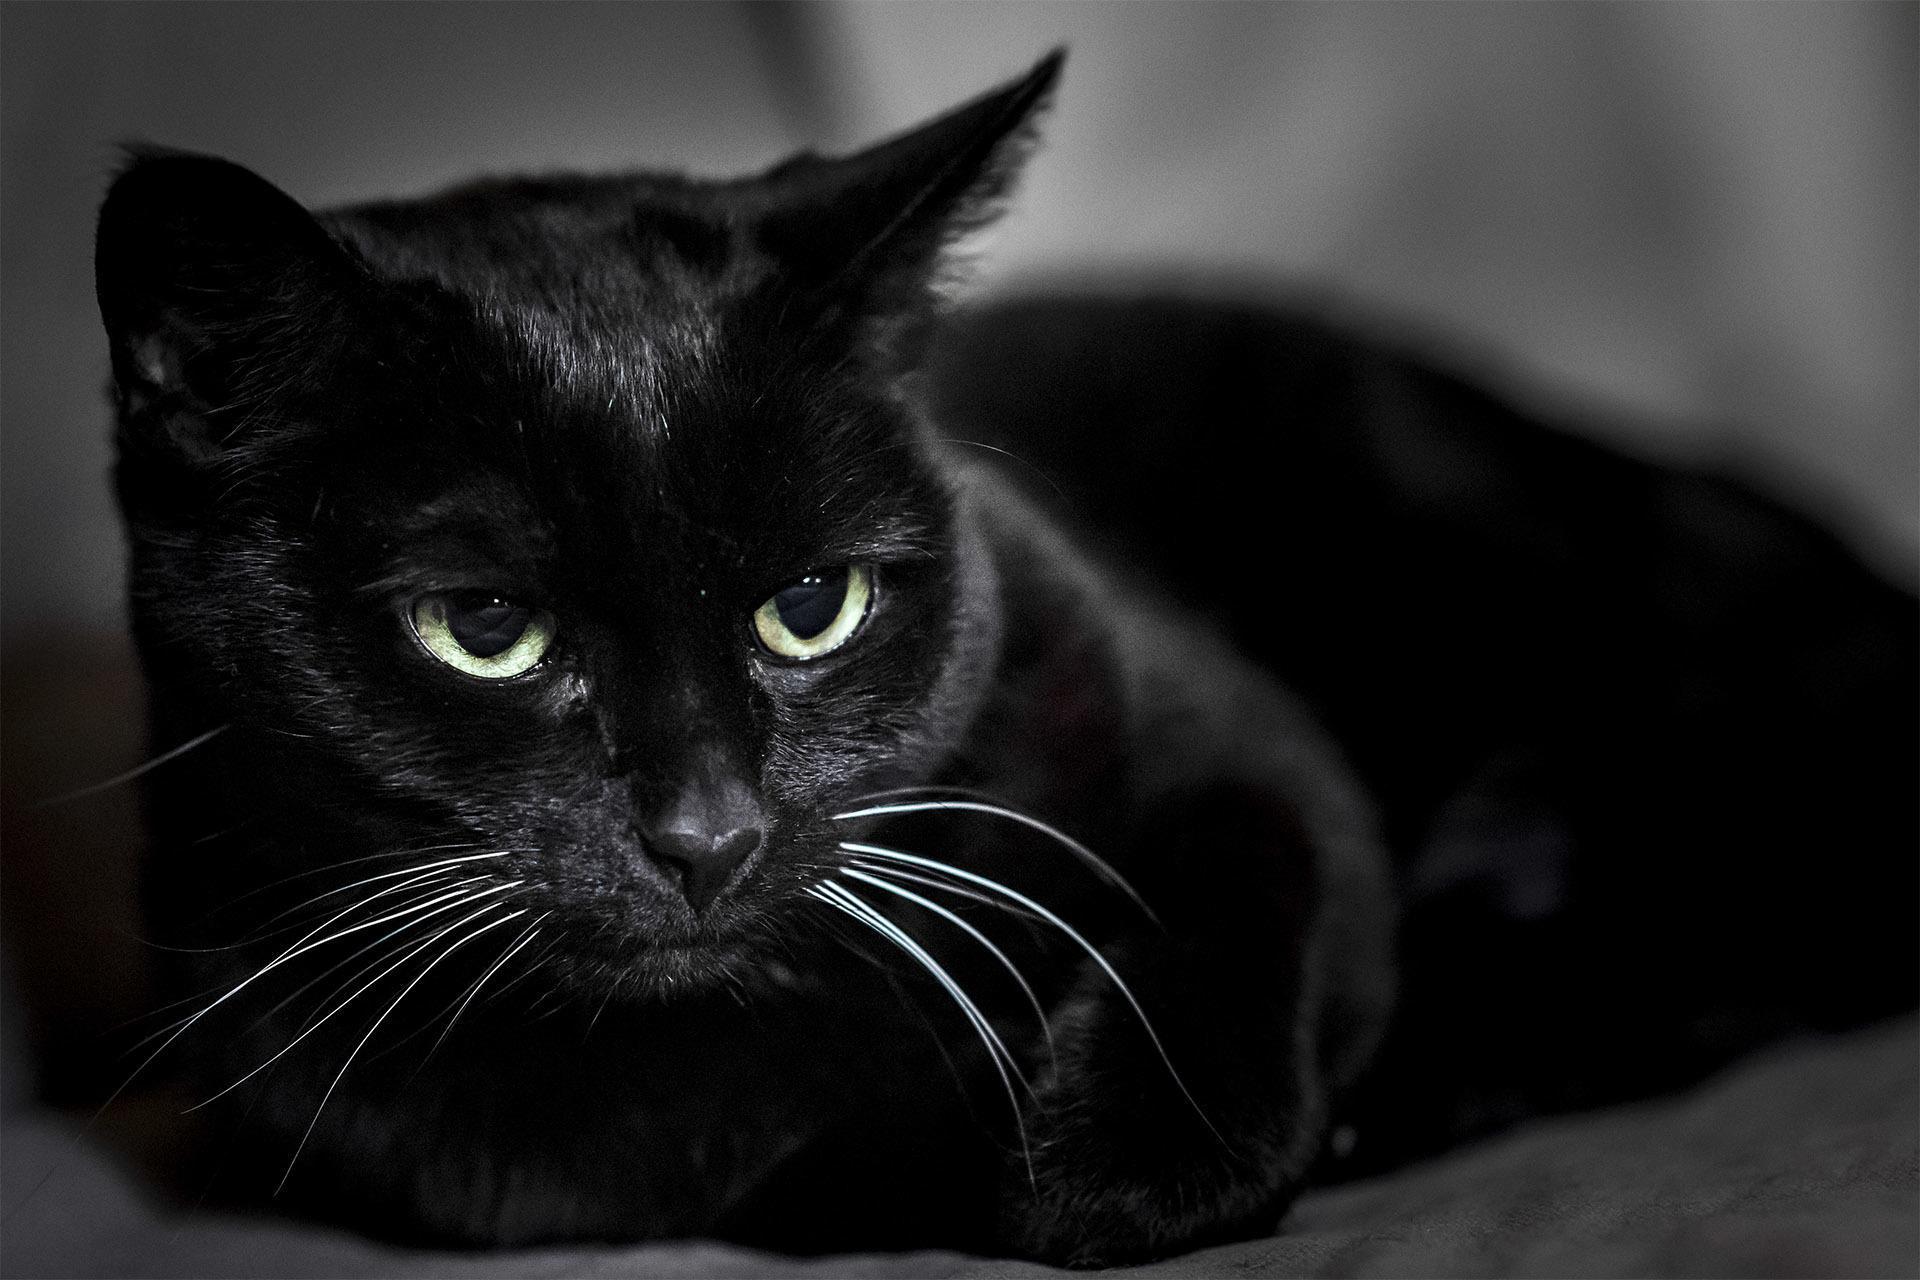 Black Cat Wallpaper Full HD (fondos y temas) for Android ...